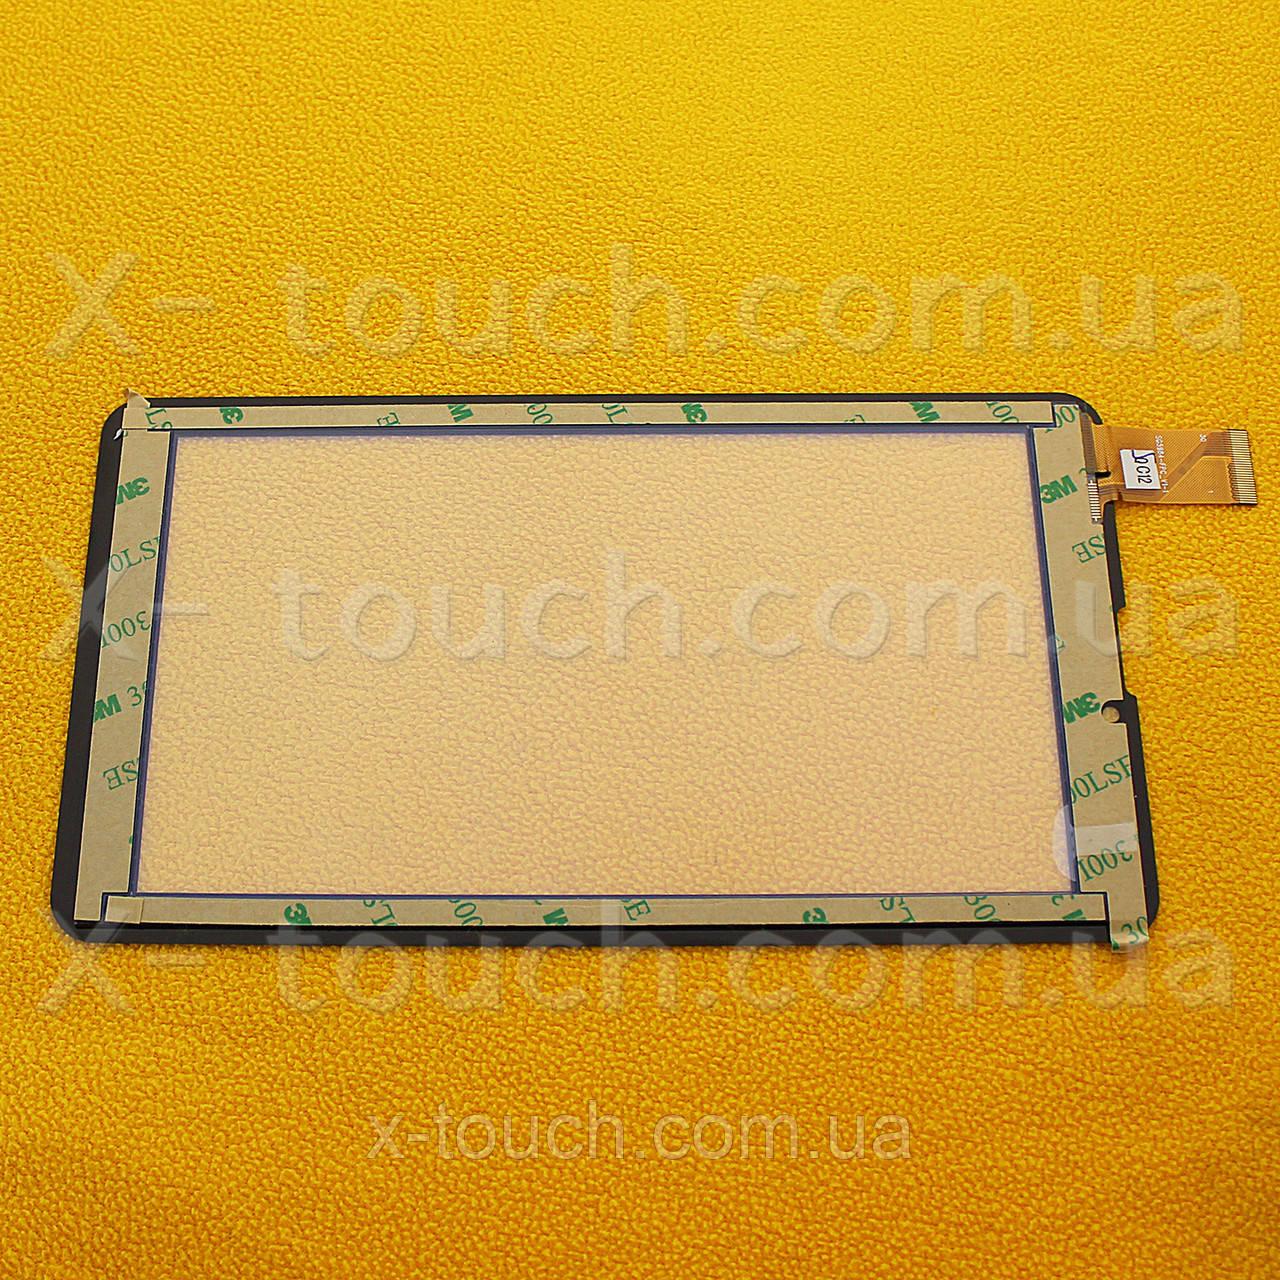 MDJ M706 FPC Y cенсор, тачскрин 7,0 дюймов